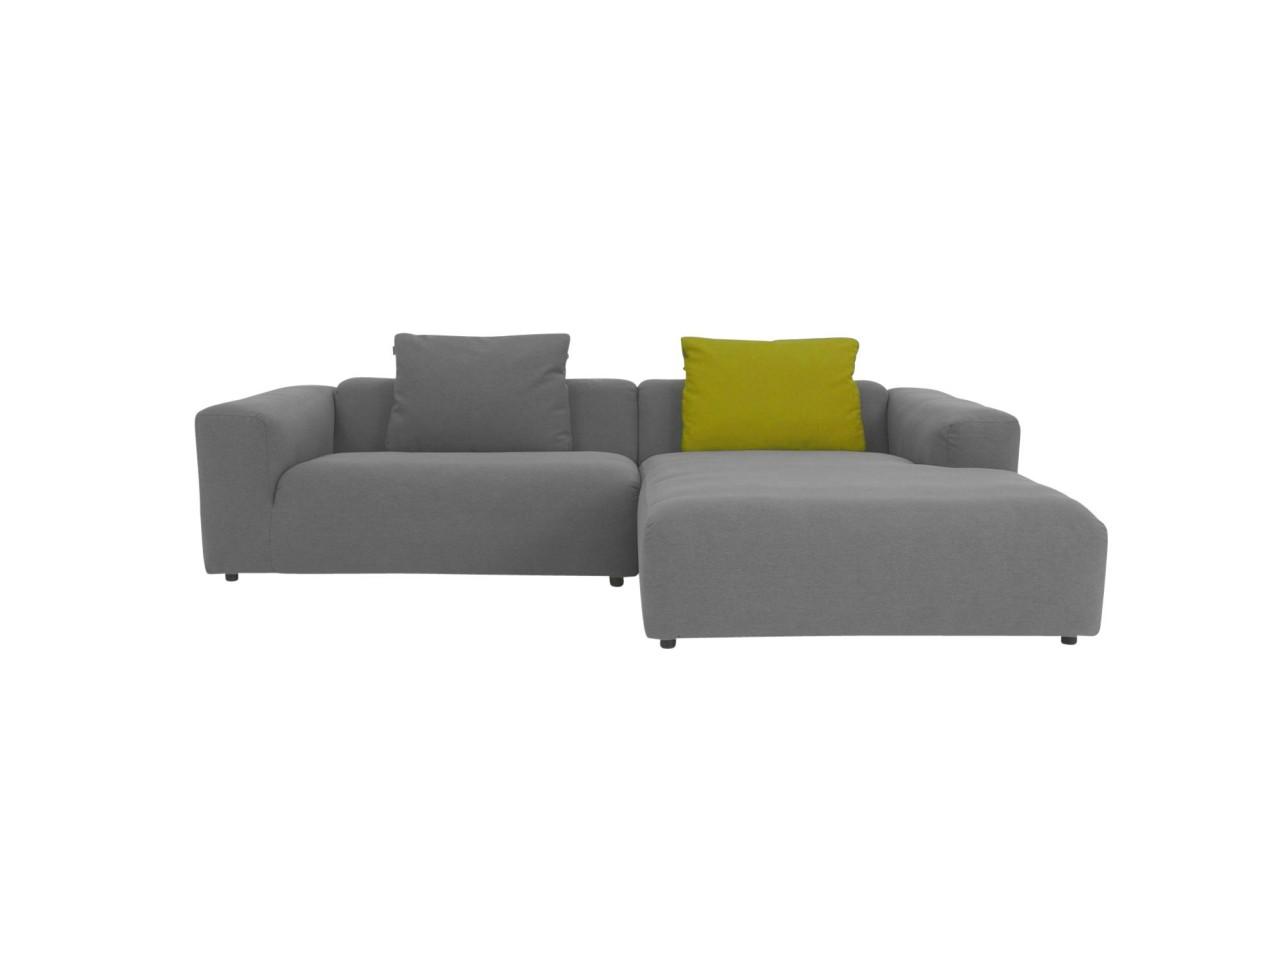 freistil 187 ROLF BENZ das absolute Lounge Sofa in grauem feinen Stoffbezug mit Longchair rechts